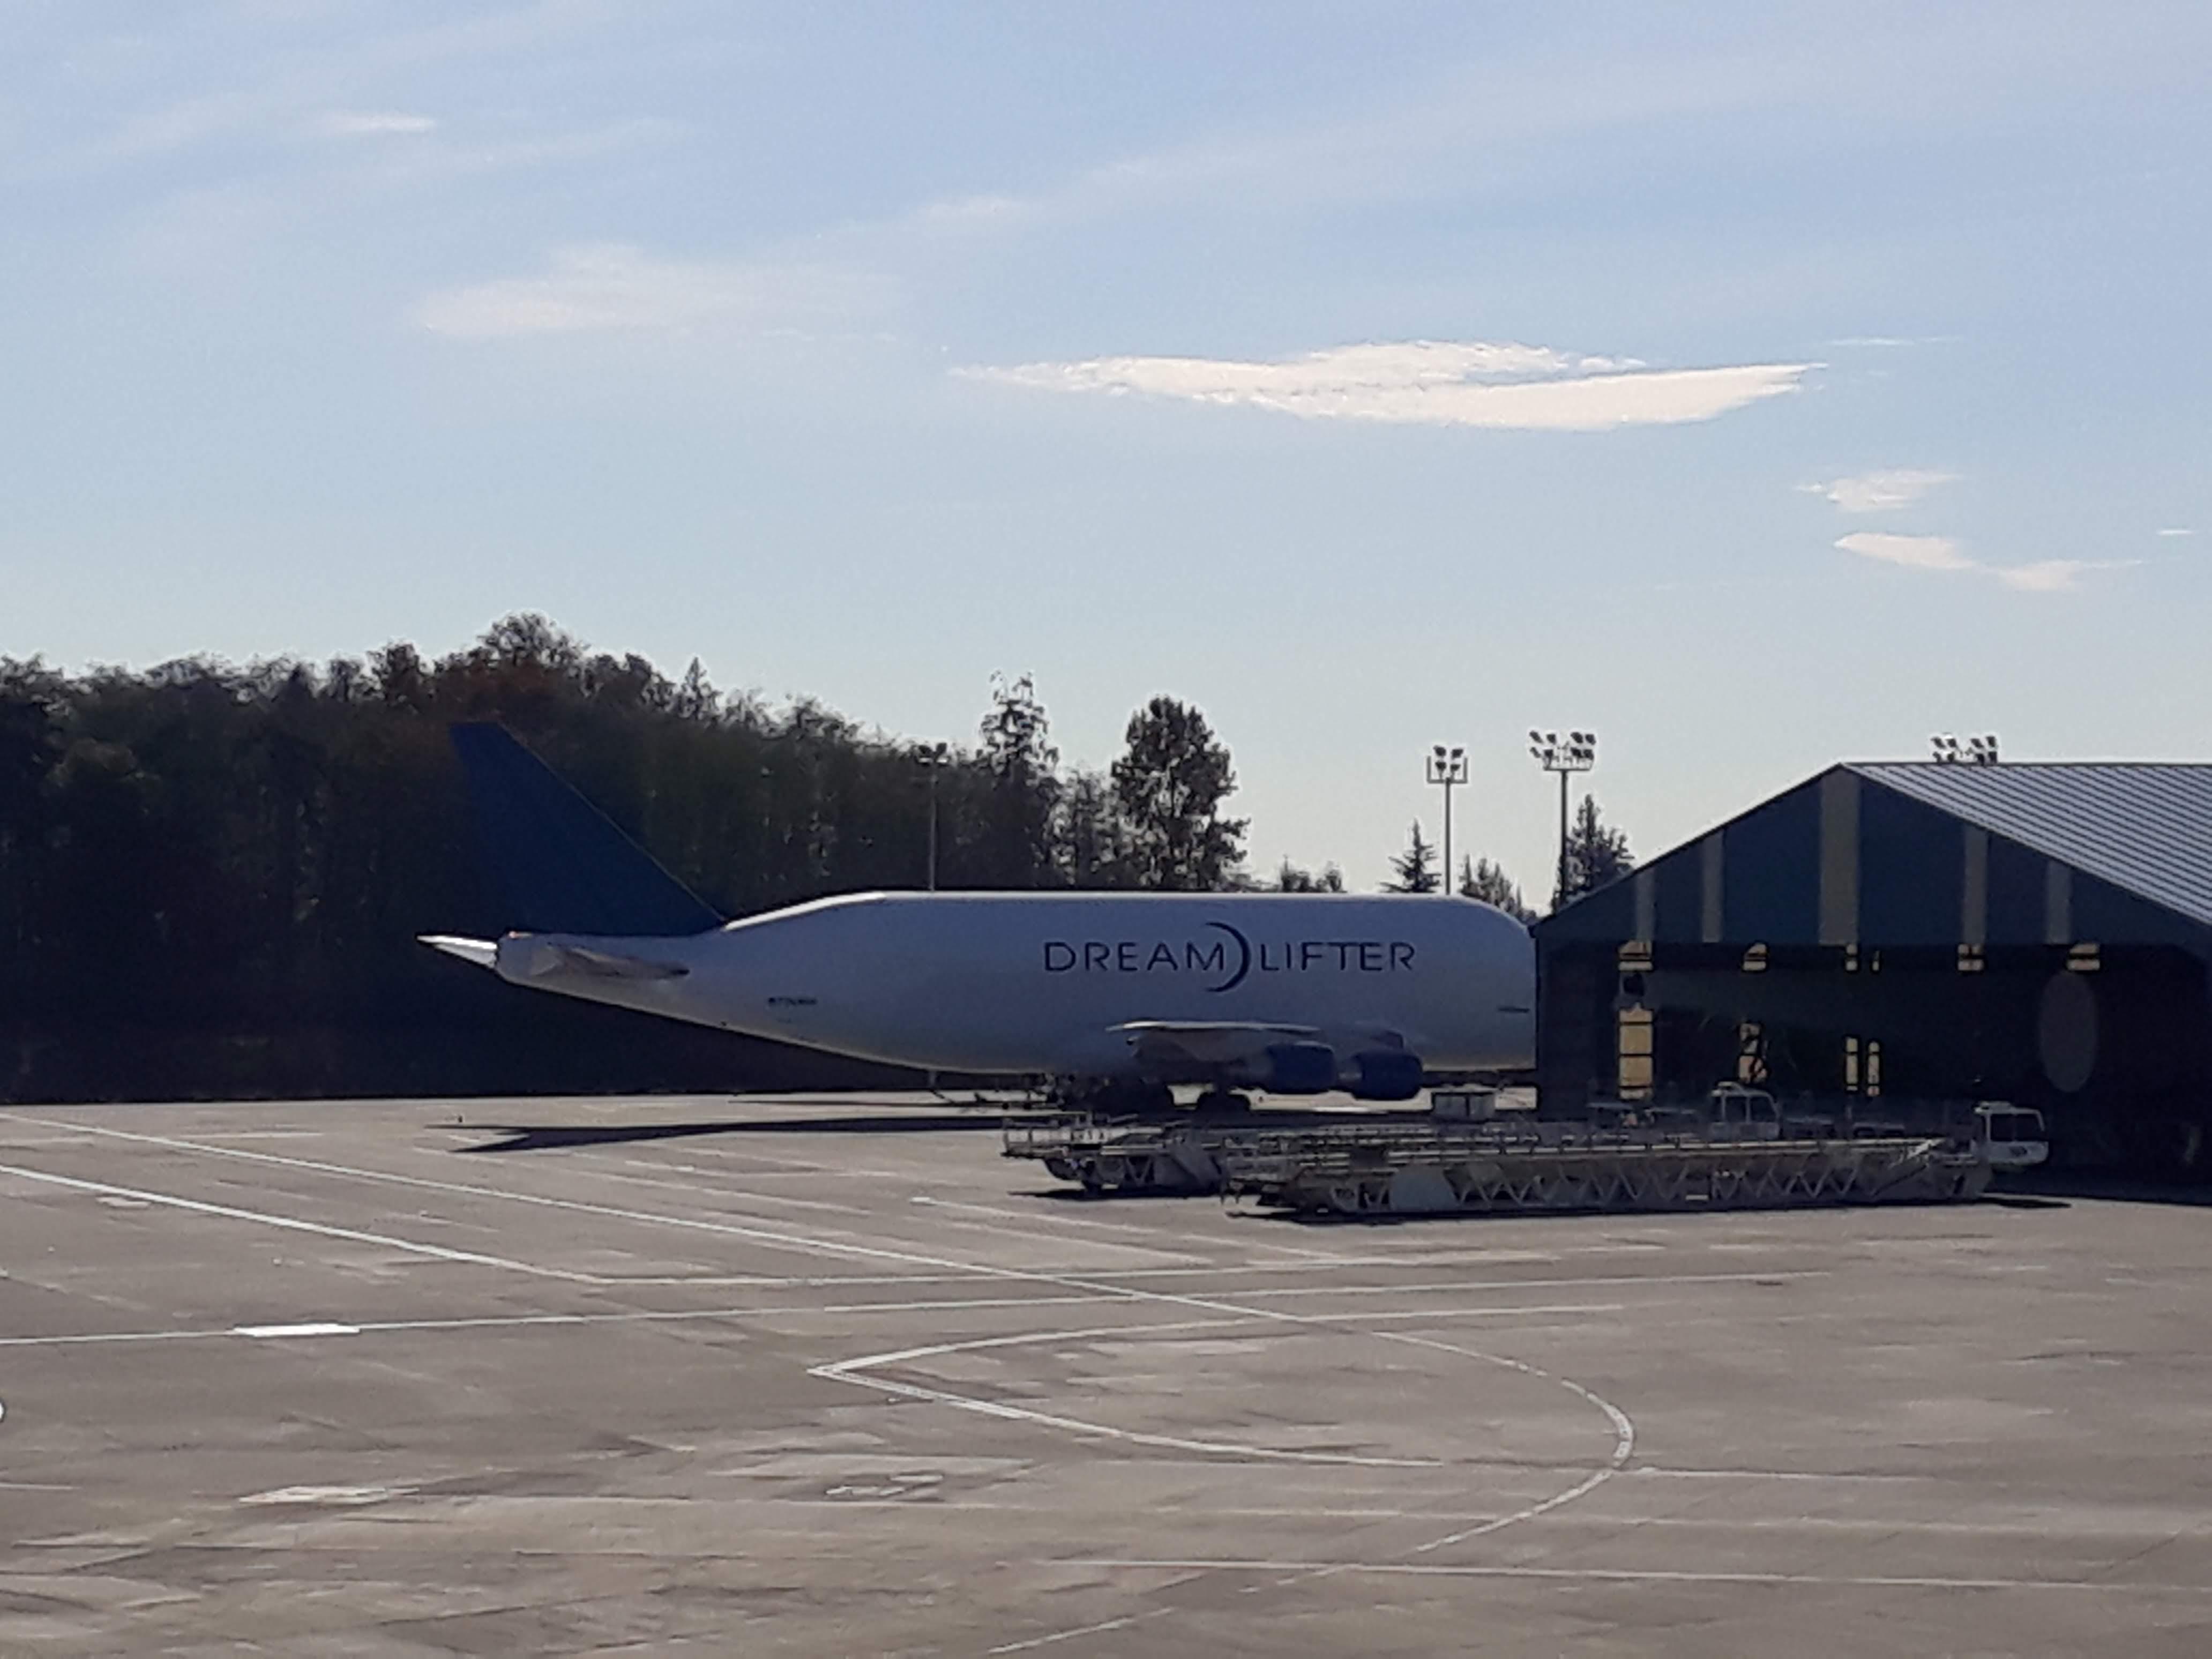 Boeing factory tour - A Dream Lifter Jet